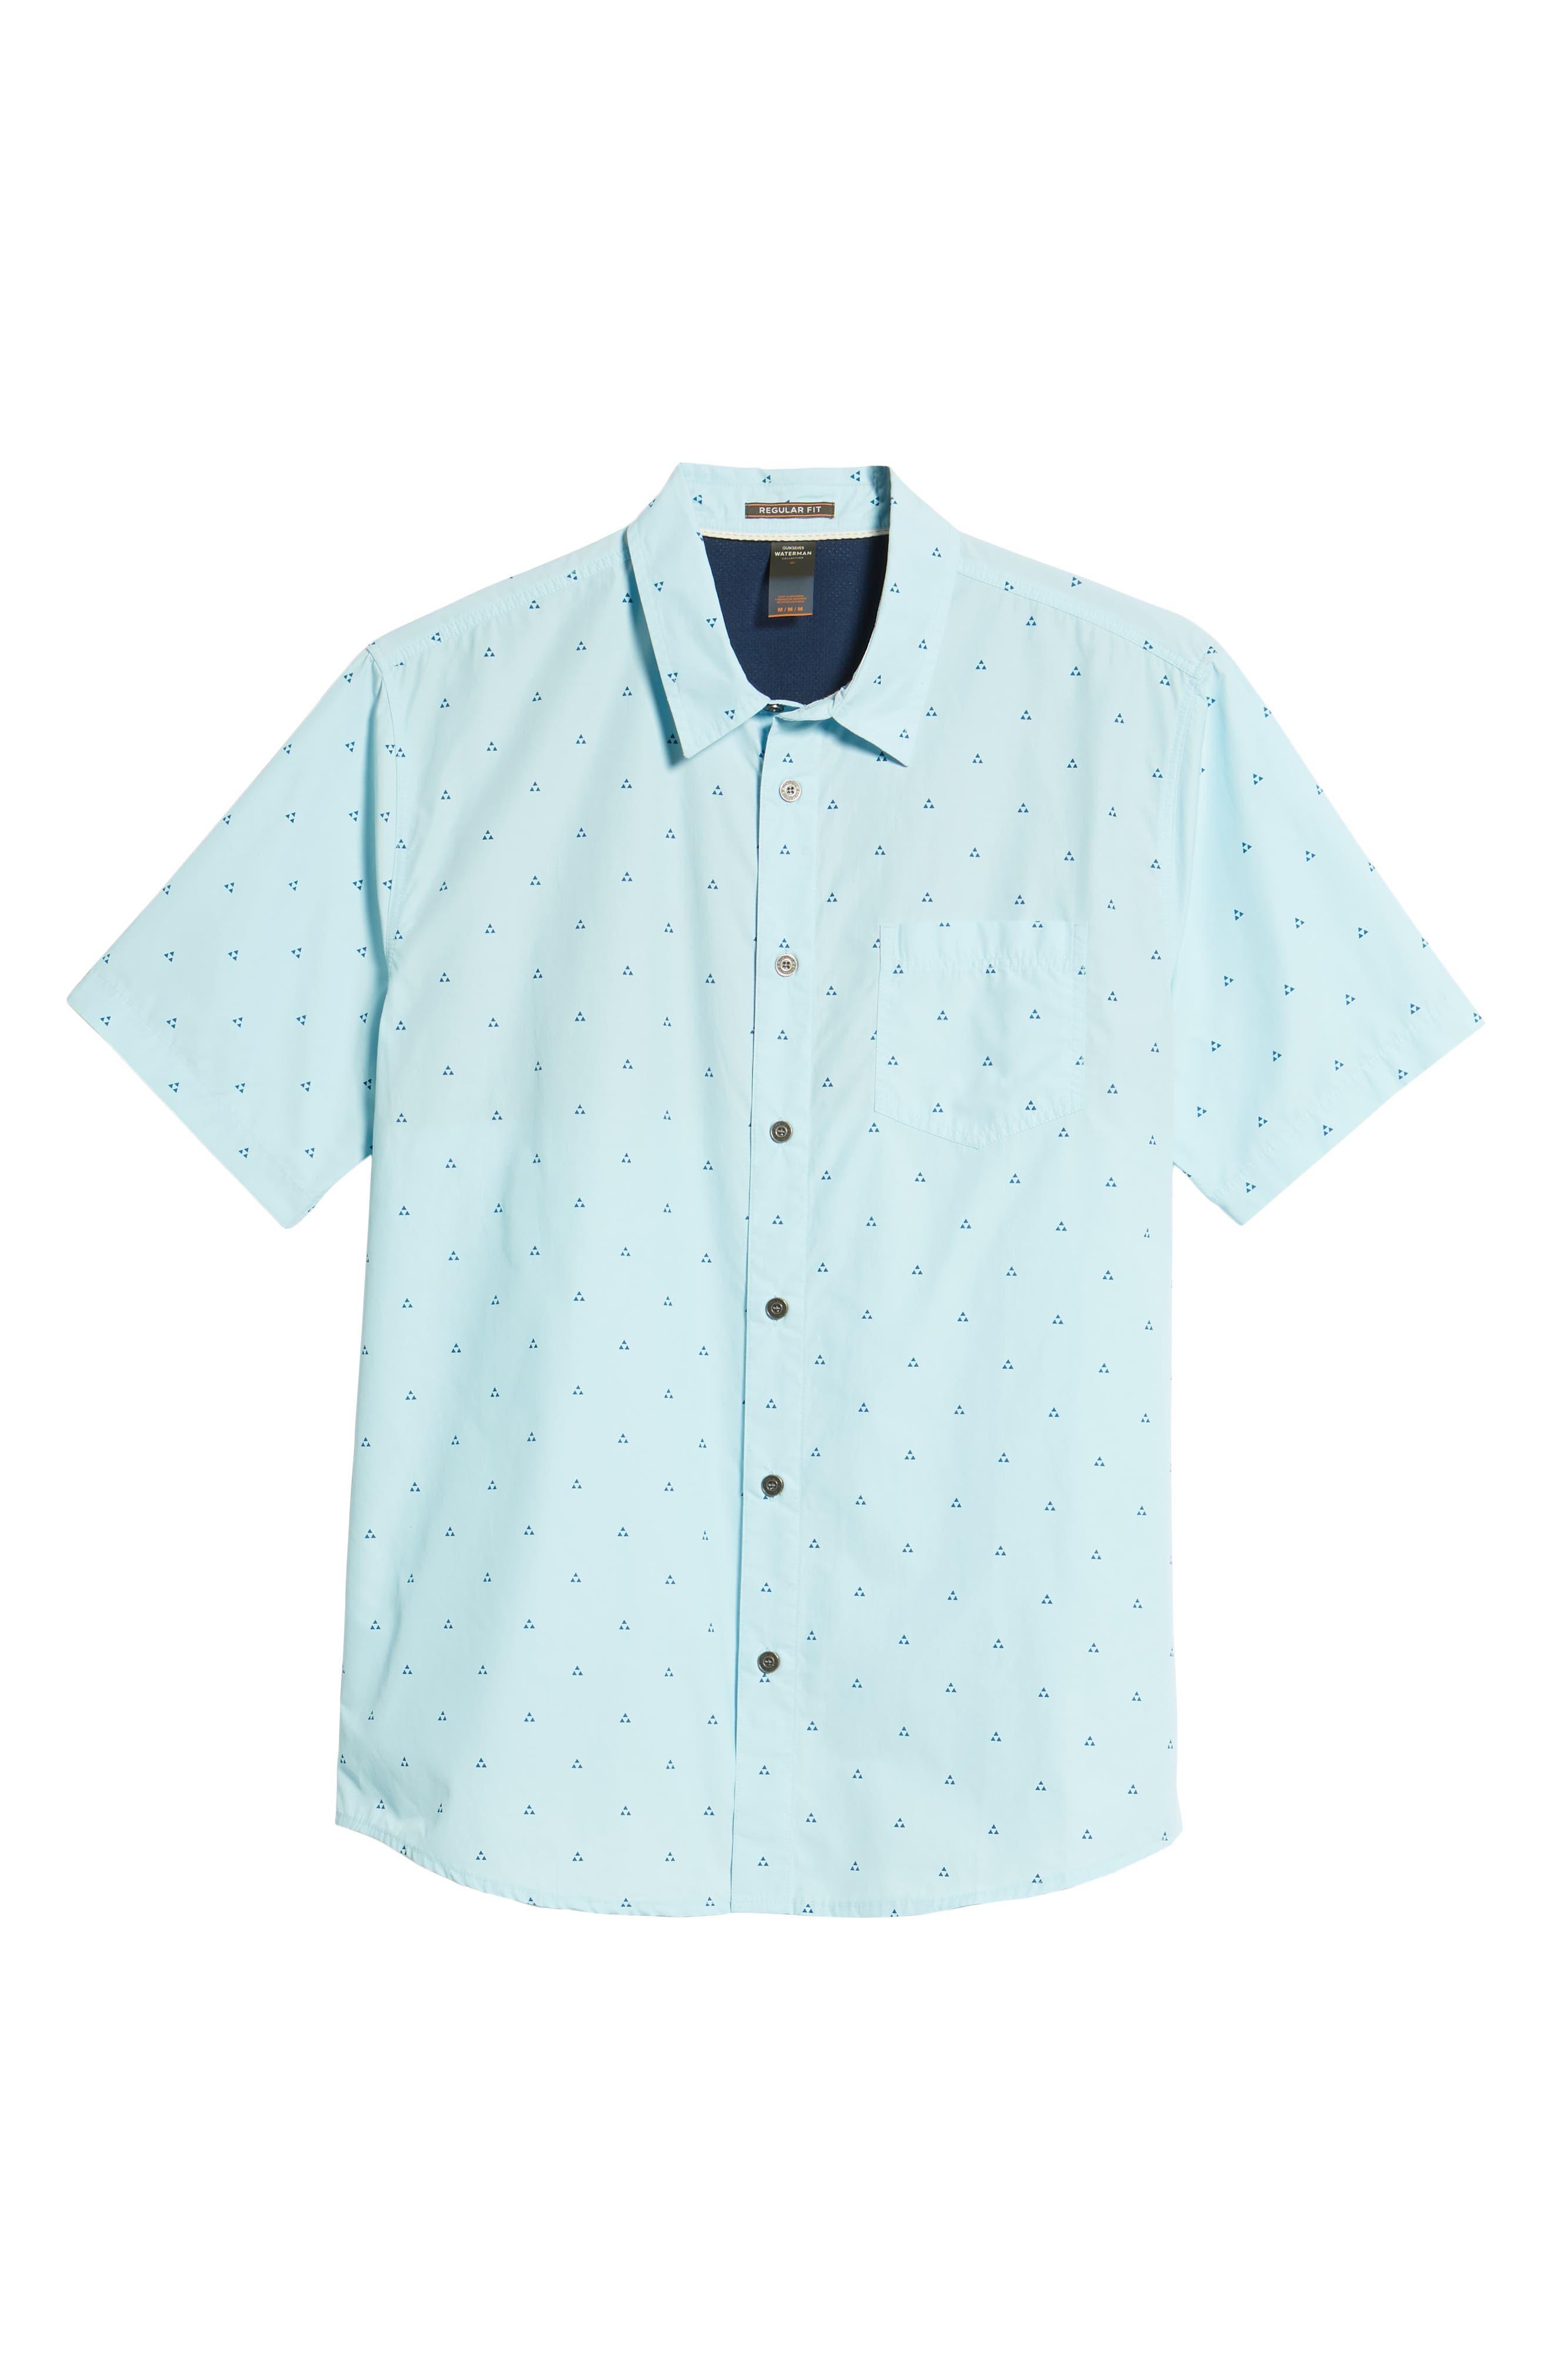 Trailblazed Regular Fit Performance Sport Shirt,                             Alternate thumbnail 6, color,                             CRYSTAL BLUE